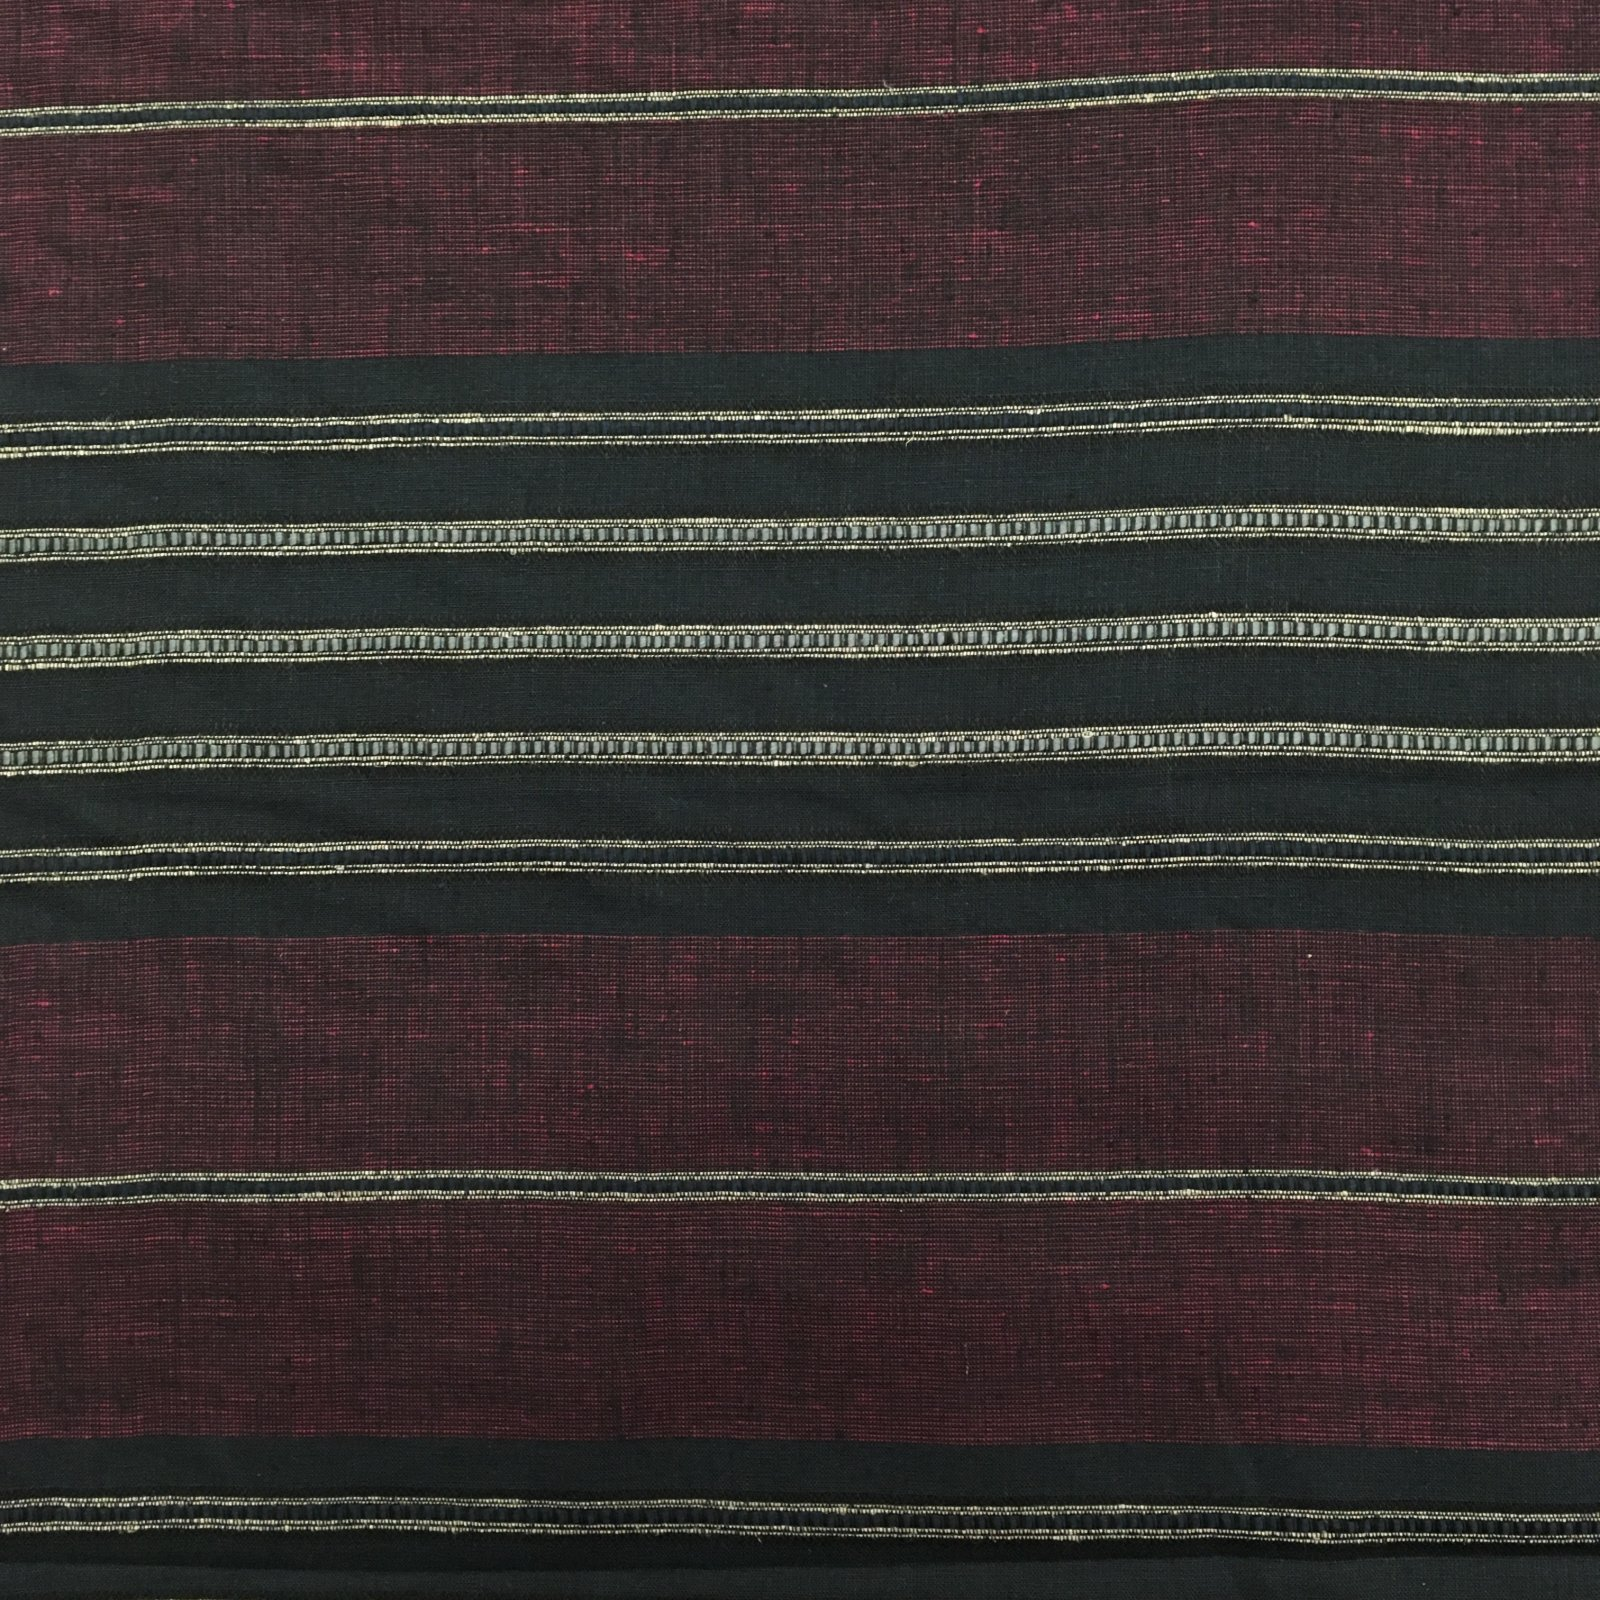 Yarn Dyed Linen - Burgundy Stripe